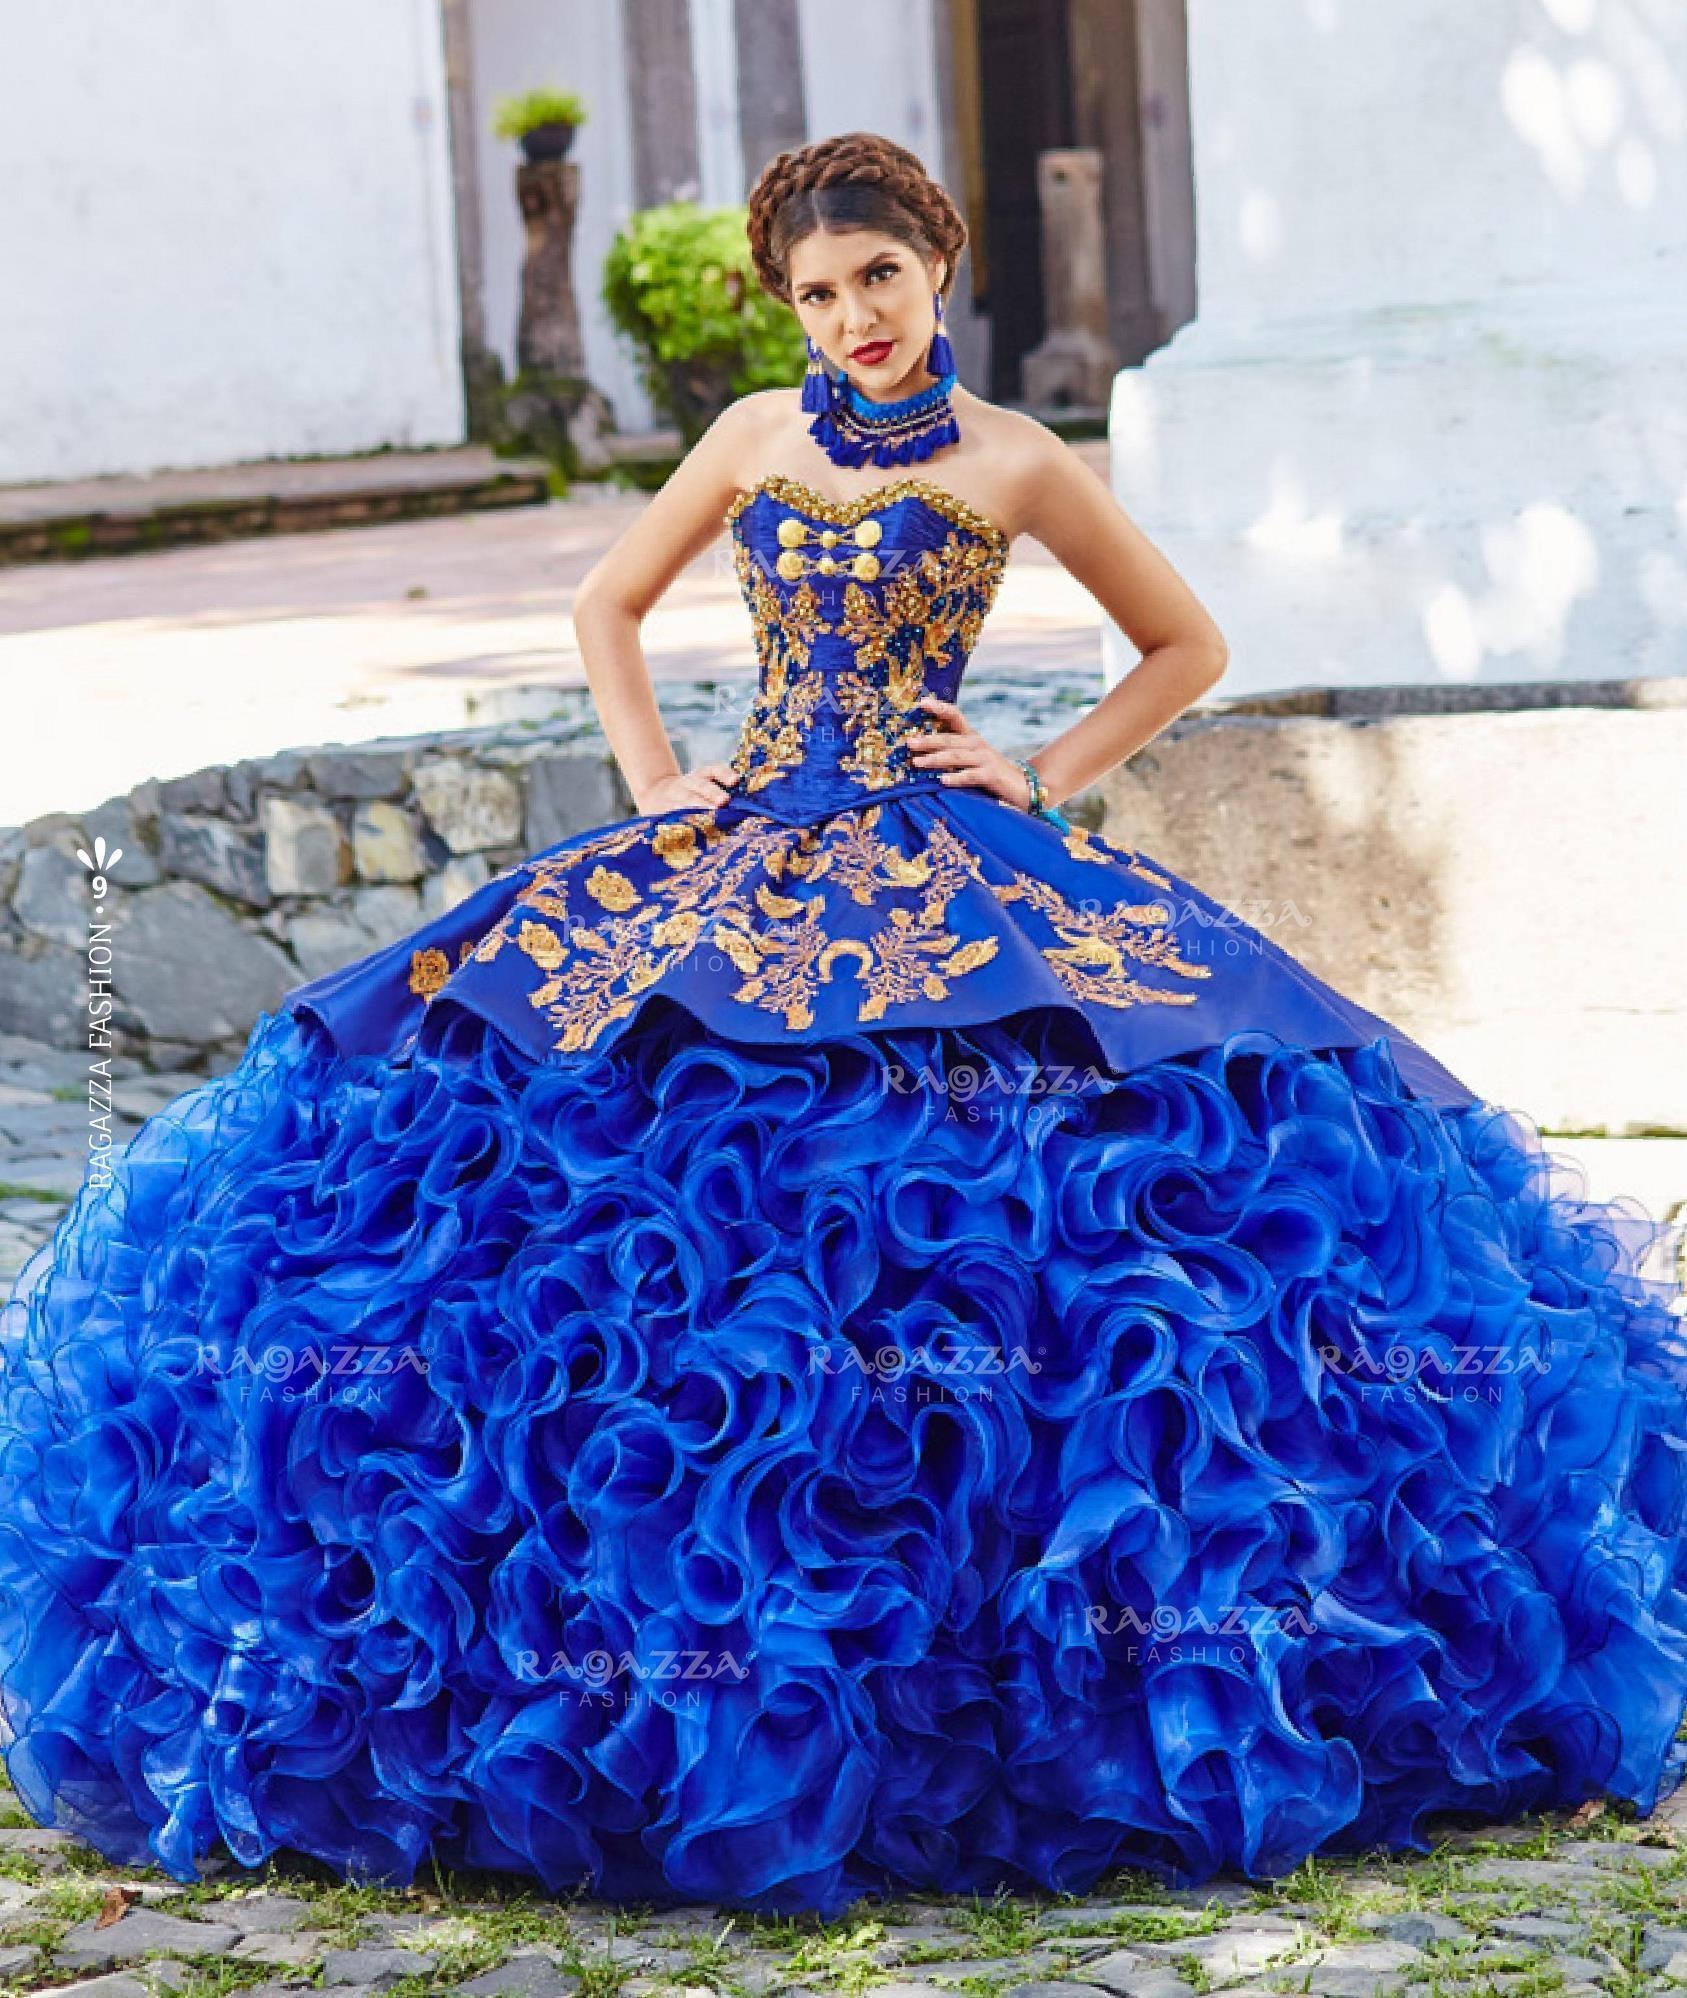 Quinceanera Dresses Disciplined Off Shoulder Blue Quinceanera Dresses Ball Gown 2019 Bow Organza Vestidos De 15 Anos Puffy Sweet 16 Prom Dress Long